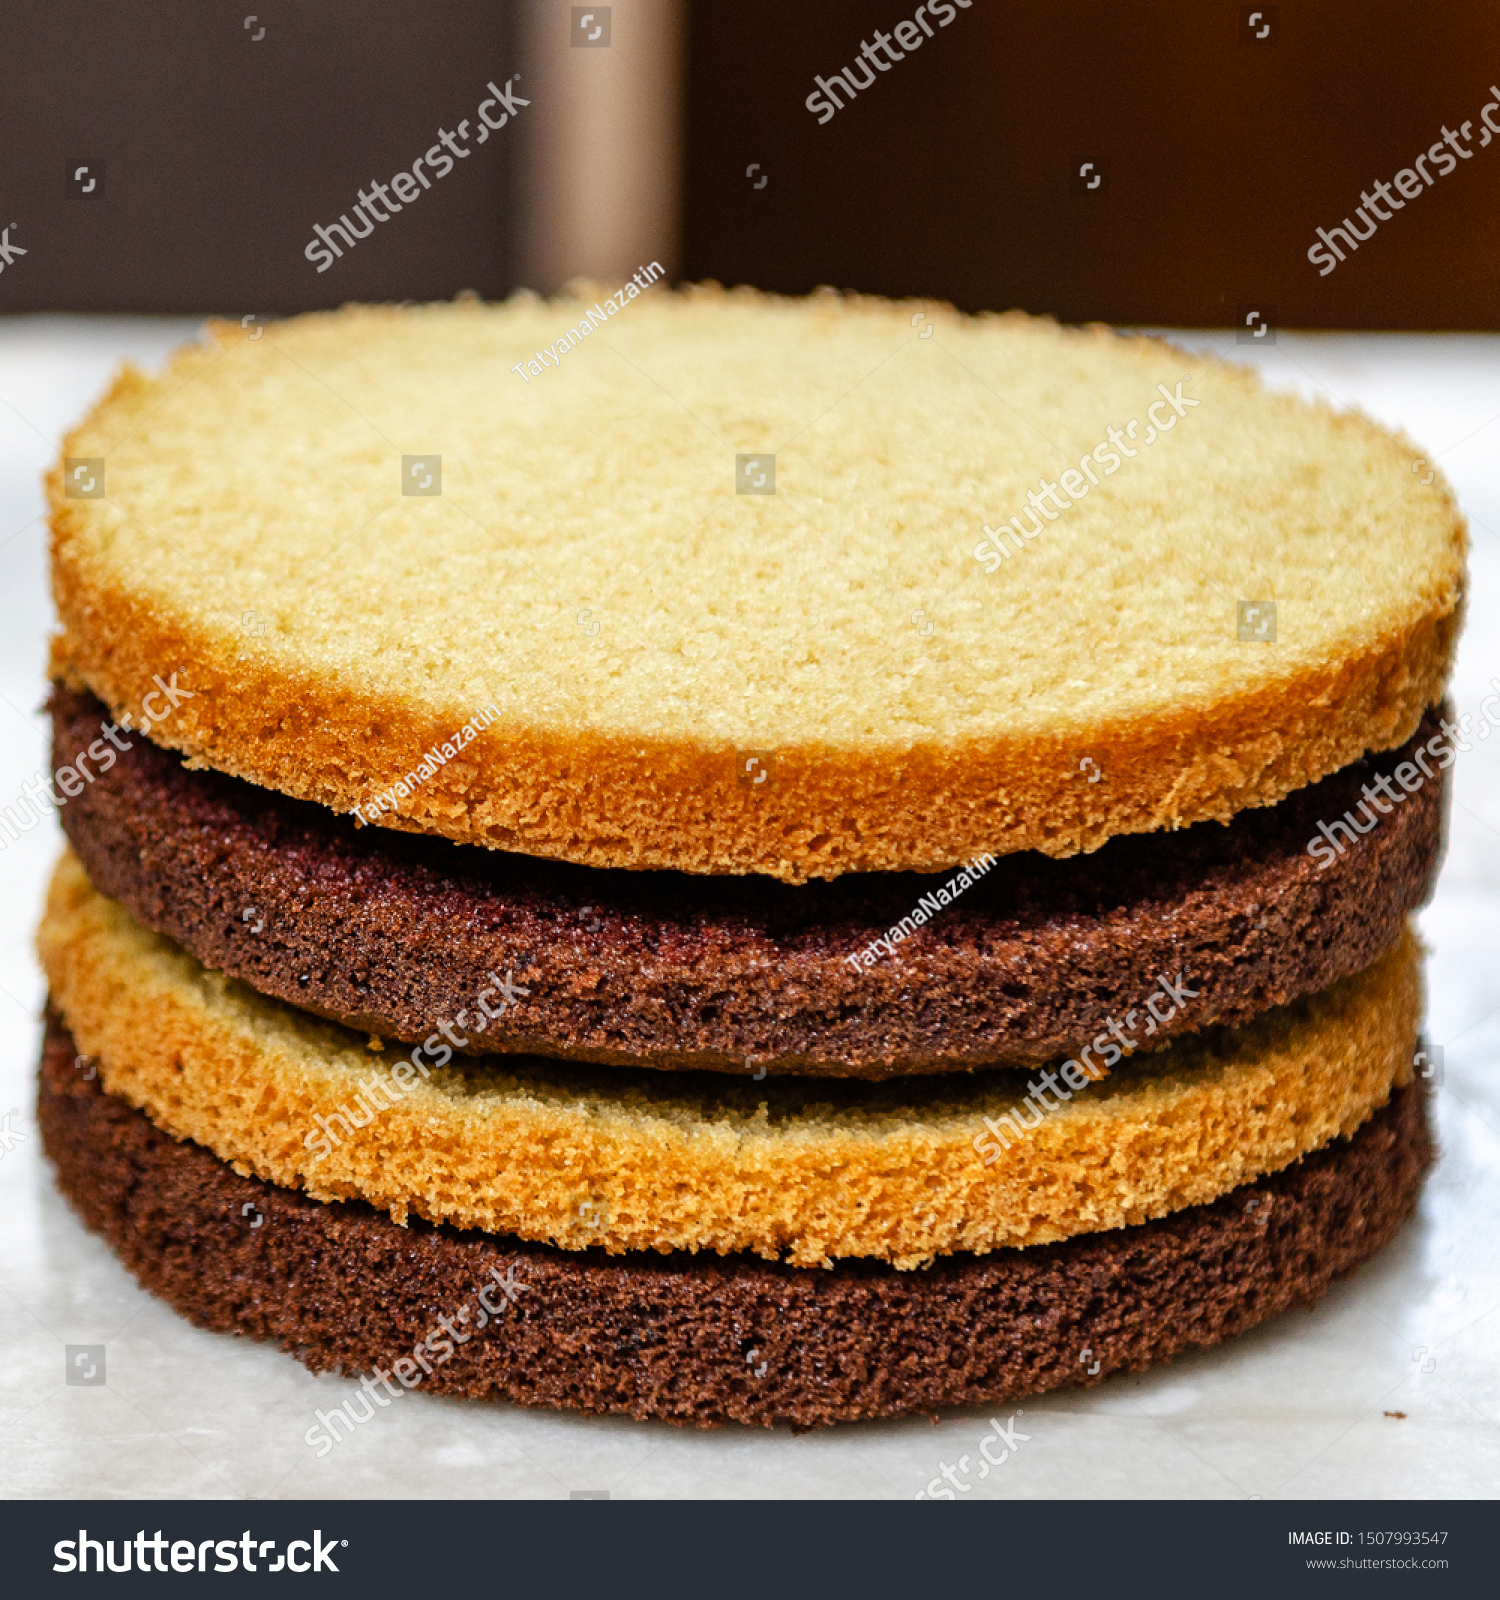 Tremendous Chocolate Vanilla Sponge Cake Birthday Cake Stock Photo Edit Now Personalised Birthday Cards Arneslily Jamesorg